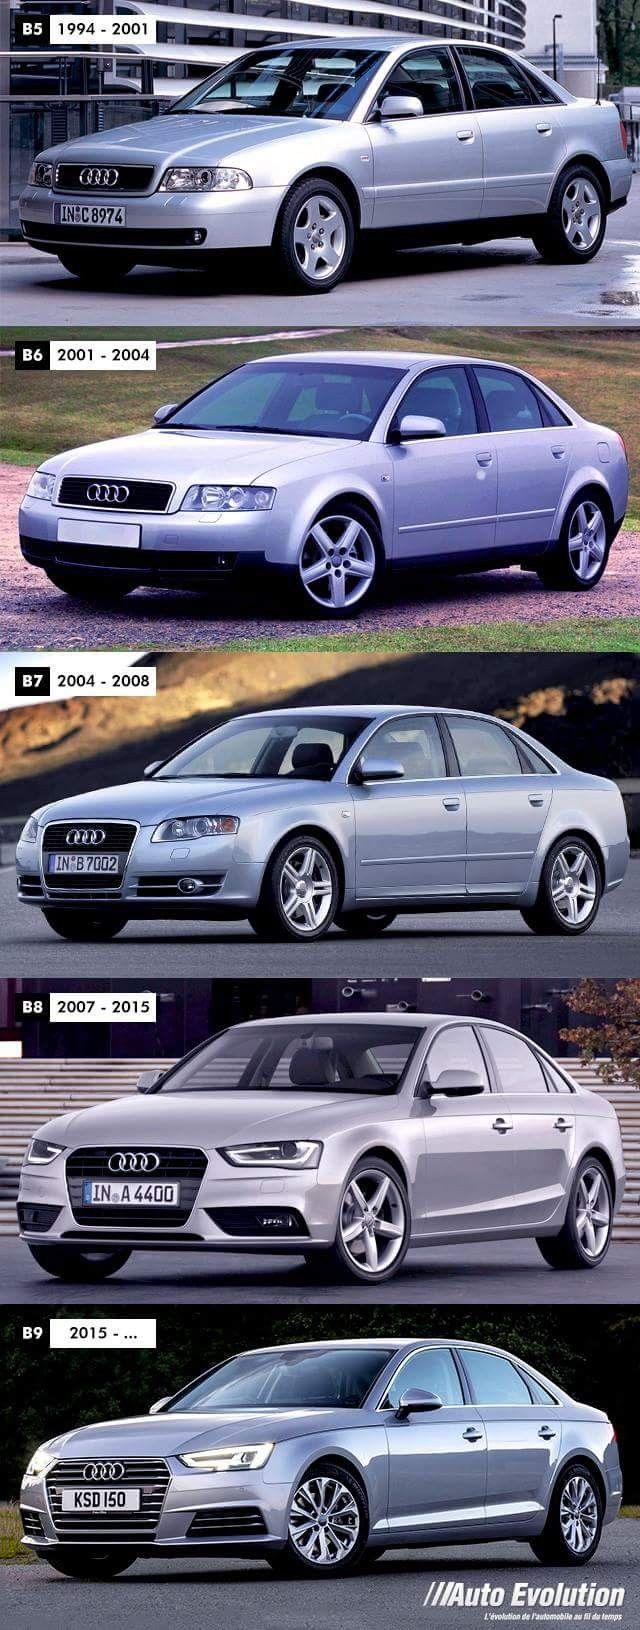 Entwicklung Audi A4 Audir8 Entwicklung Audi A4 Audi A4 Retro Cars Audi